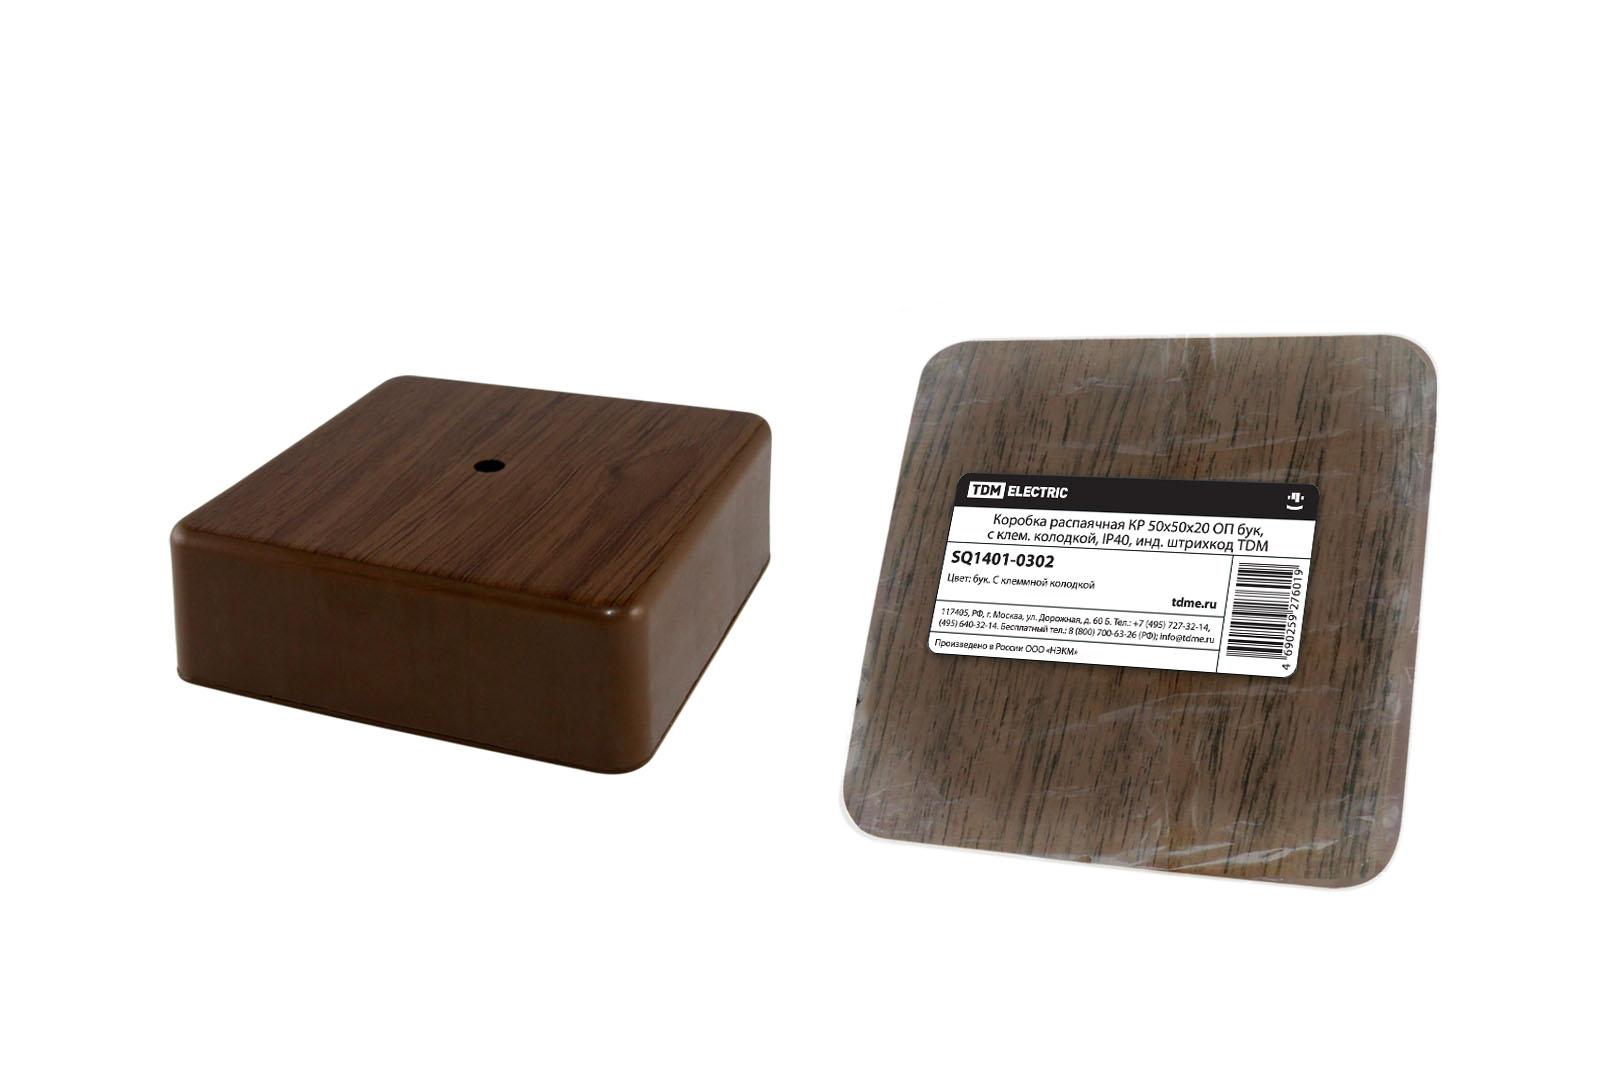 Фото Коробка распаячная КР 50х50х20 ОП бук, с клем. колодкой, IP40, инд. штрихкод TDM {SQ1401-0302}